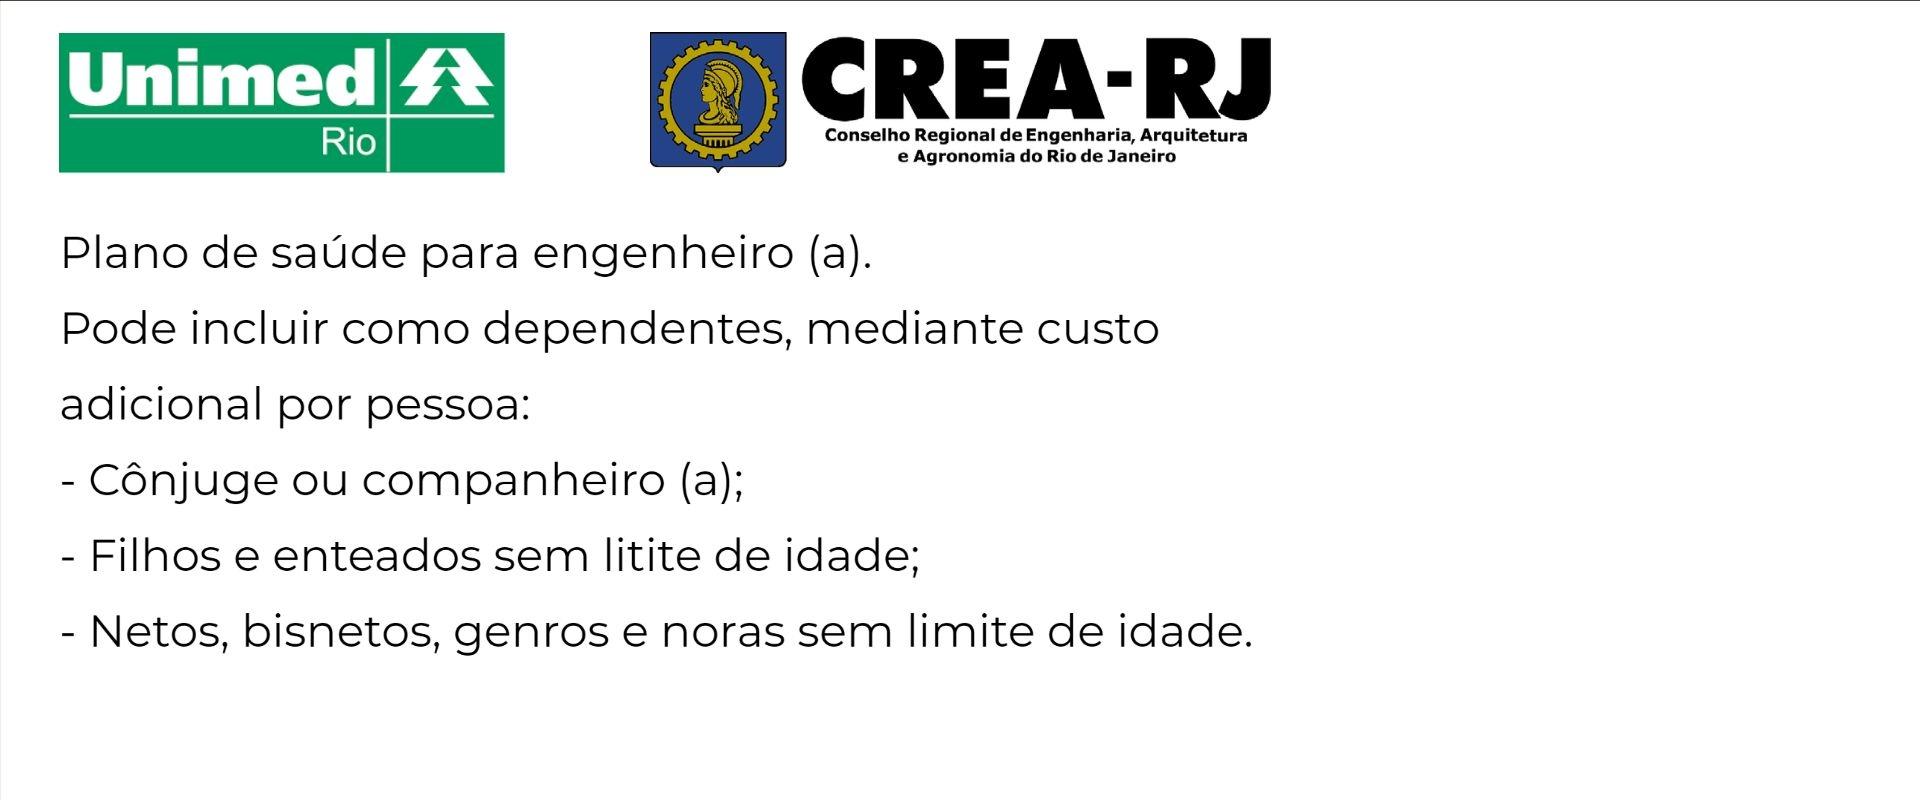 Unimed Rio CREA-RJ Mutua